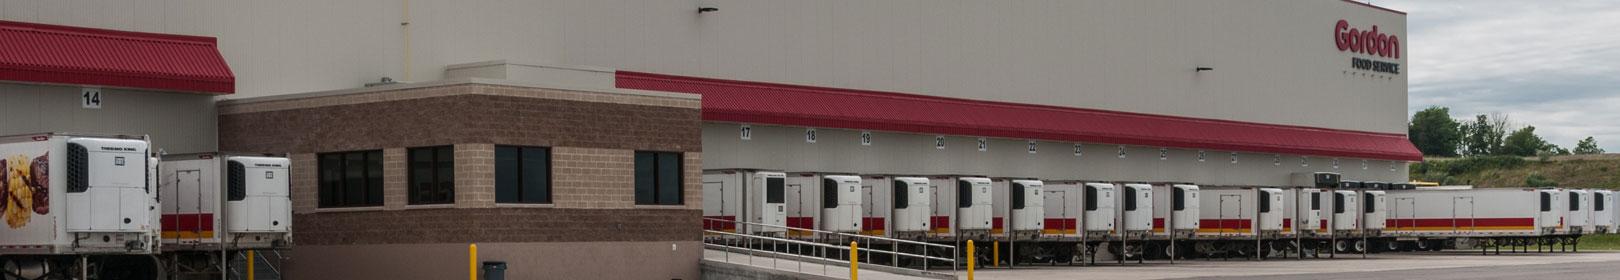 Lighthouse Electric   Gordon Food Services Distribution Center